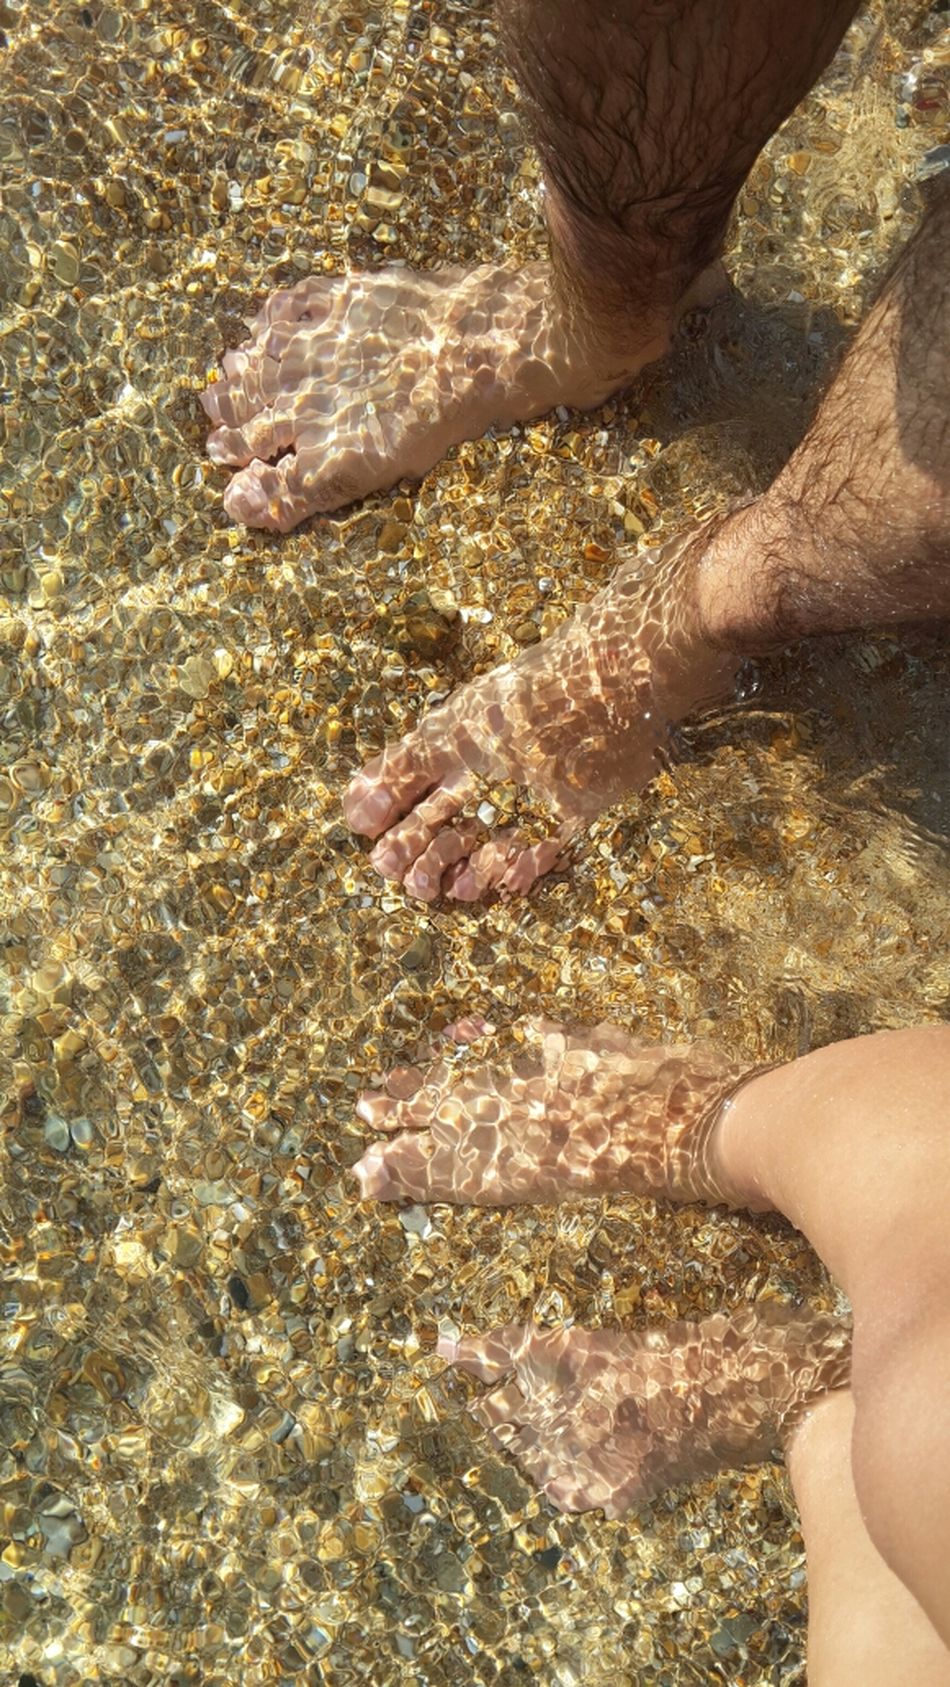 Sea Relaxing Selfi : ) Sunshine =))))))